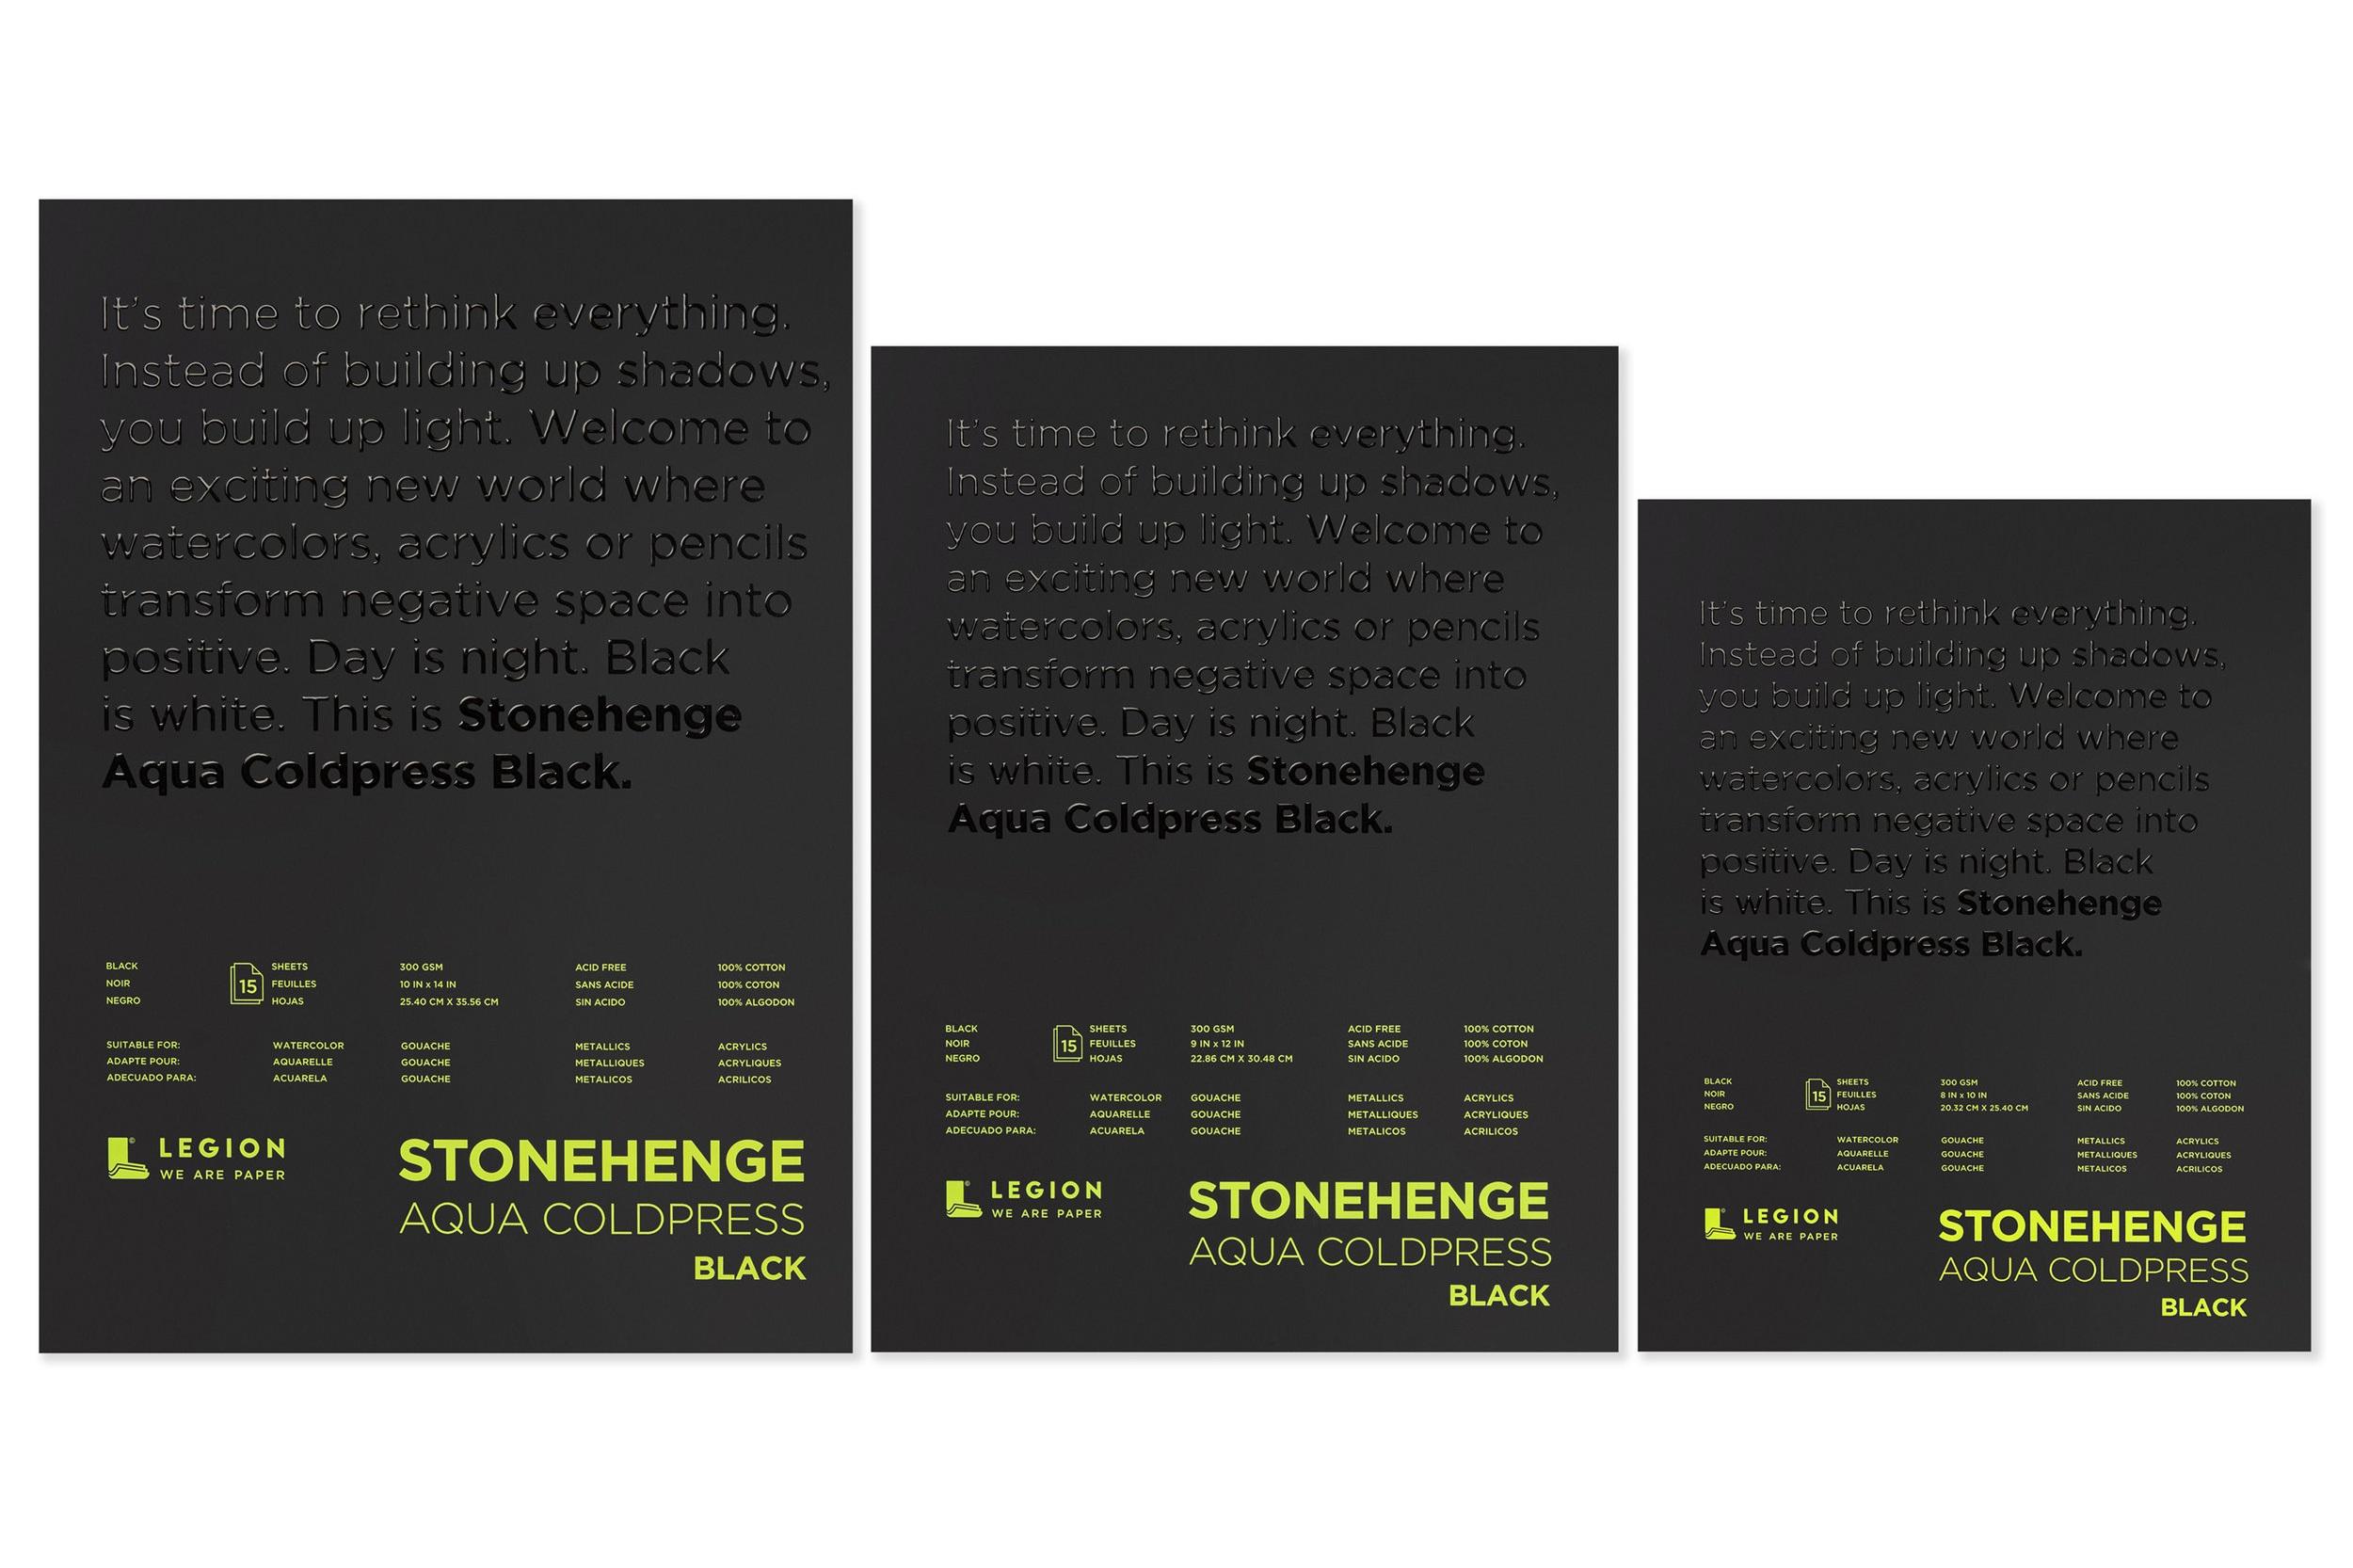 StonehengeAqua_Black_family.jpg